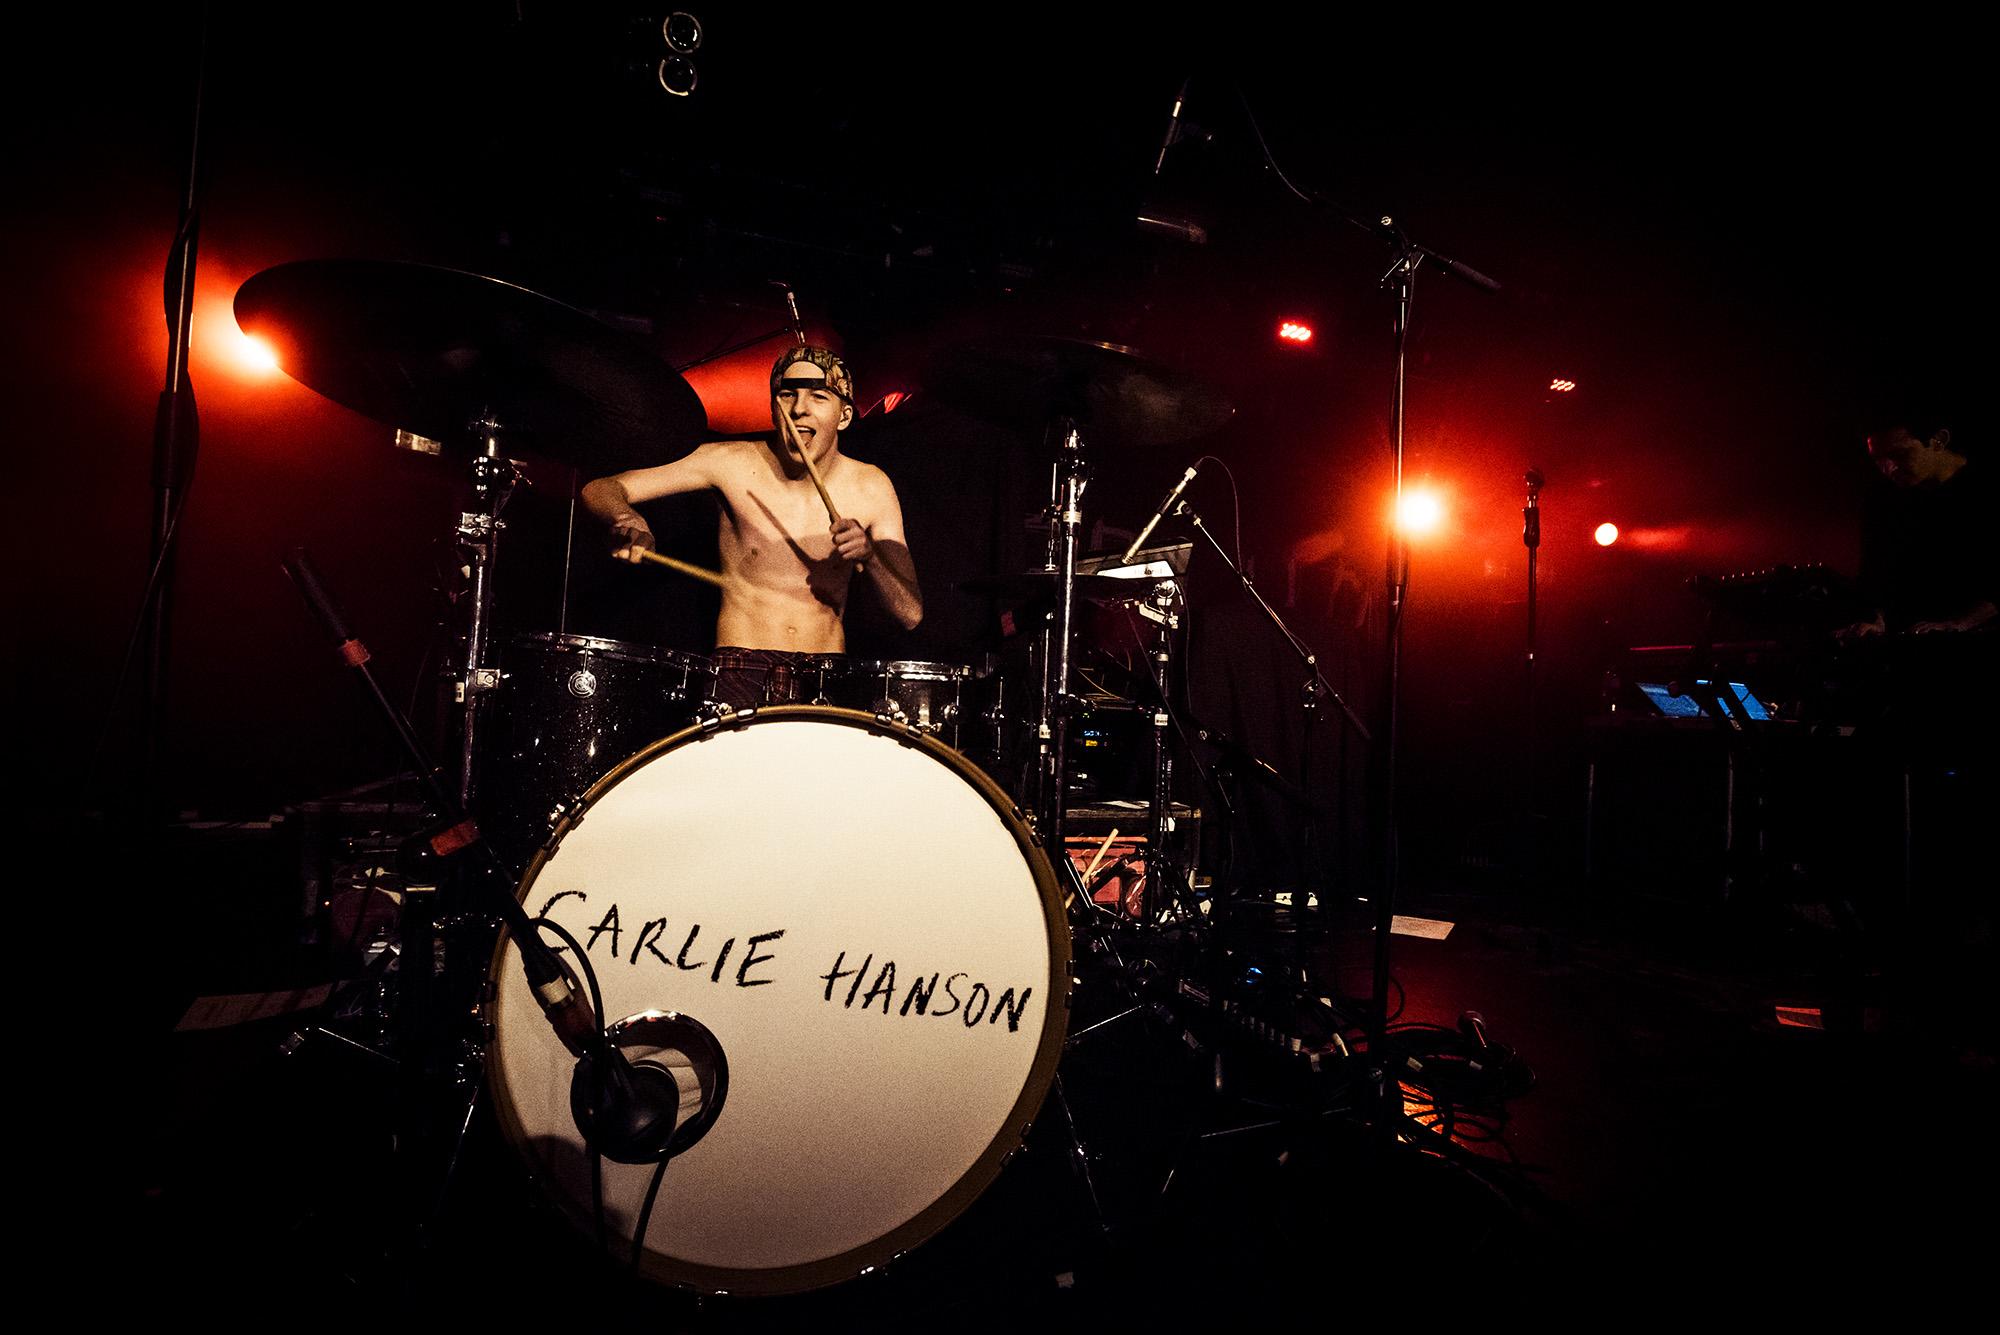 Carlie Hanson - Birmingham - Rachel Prew 1.jpg